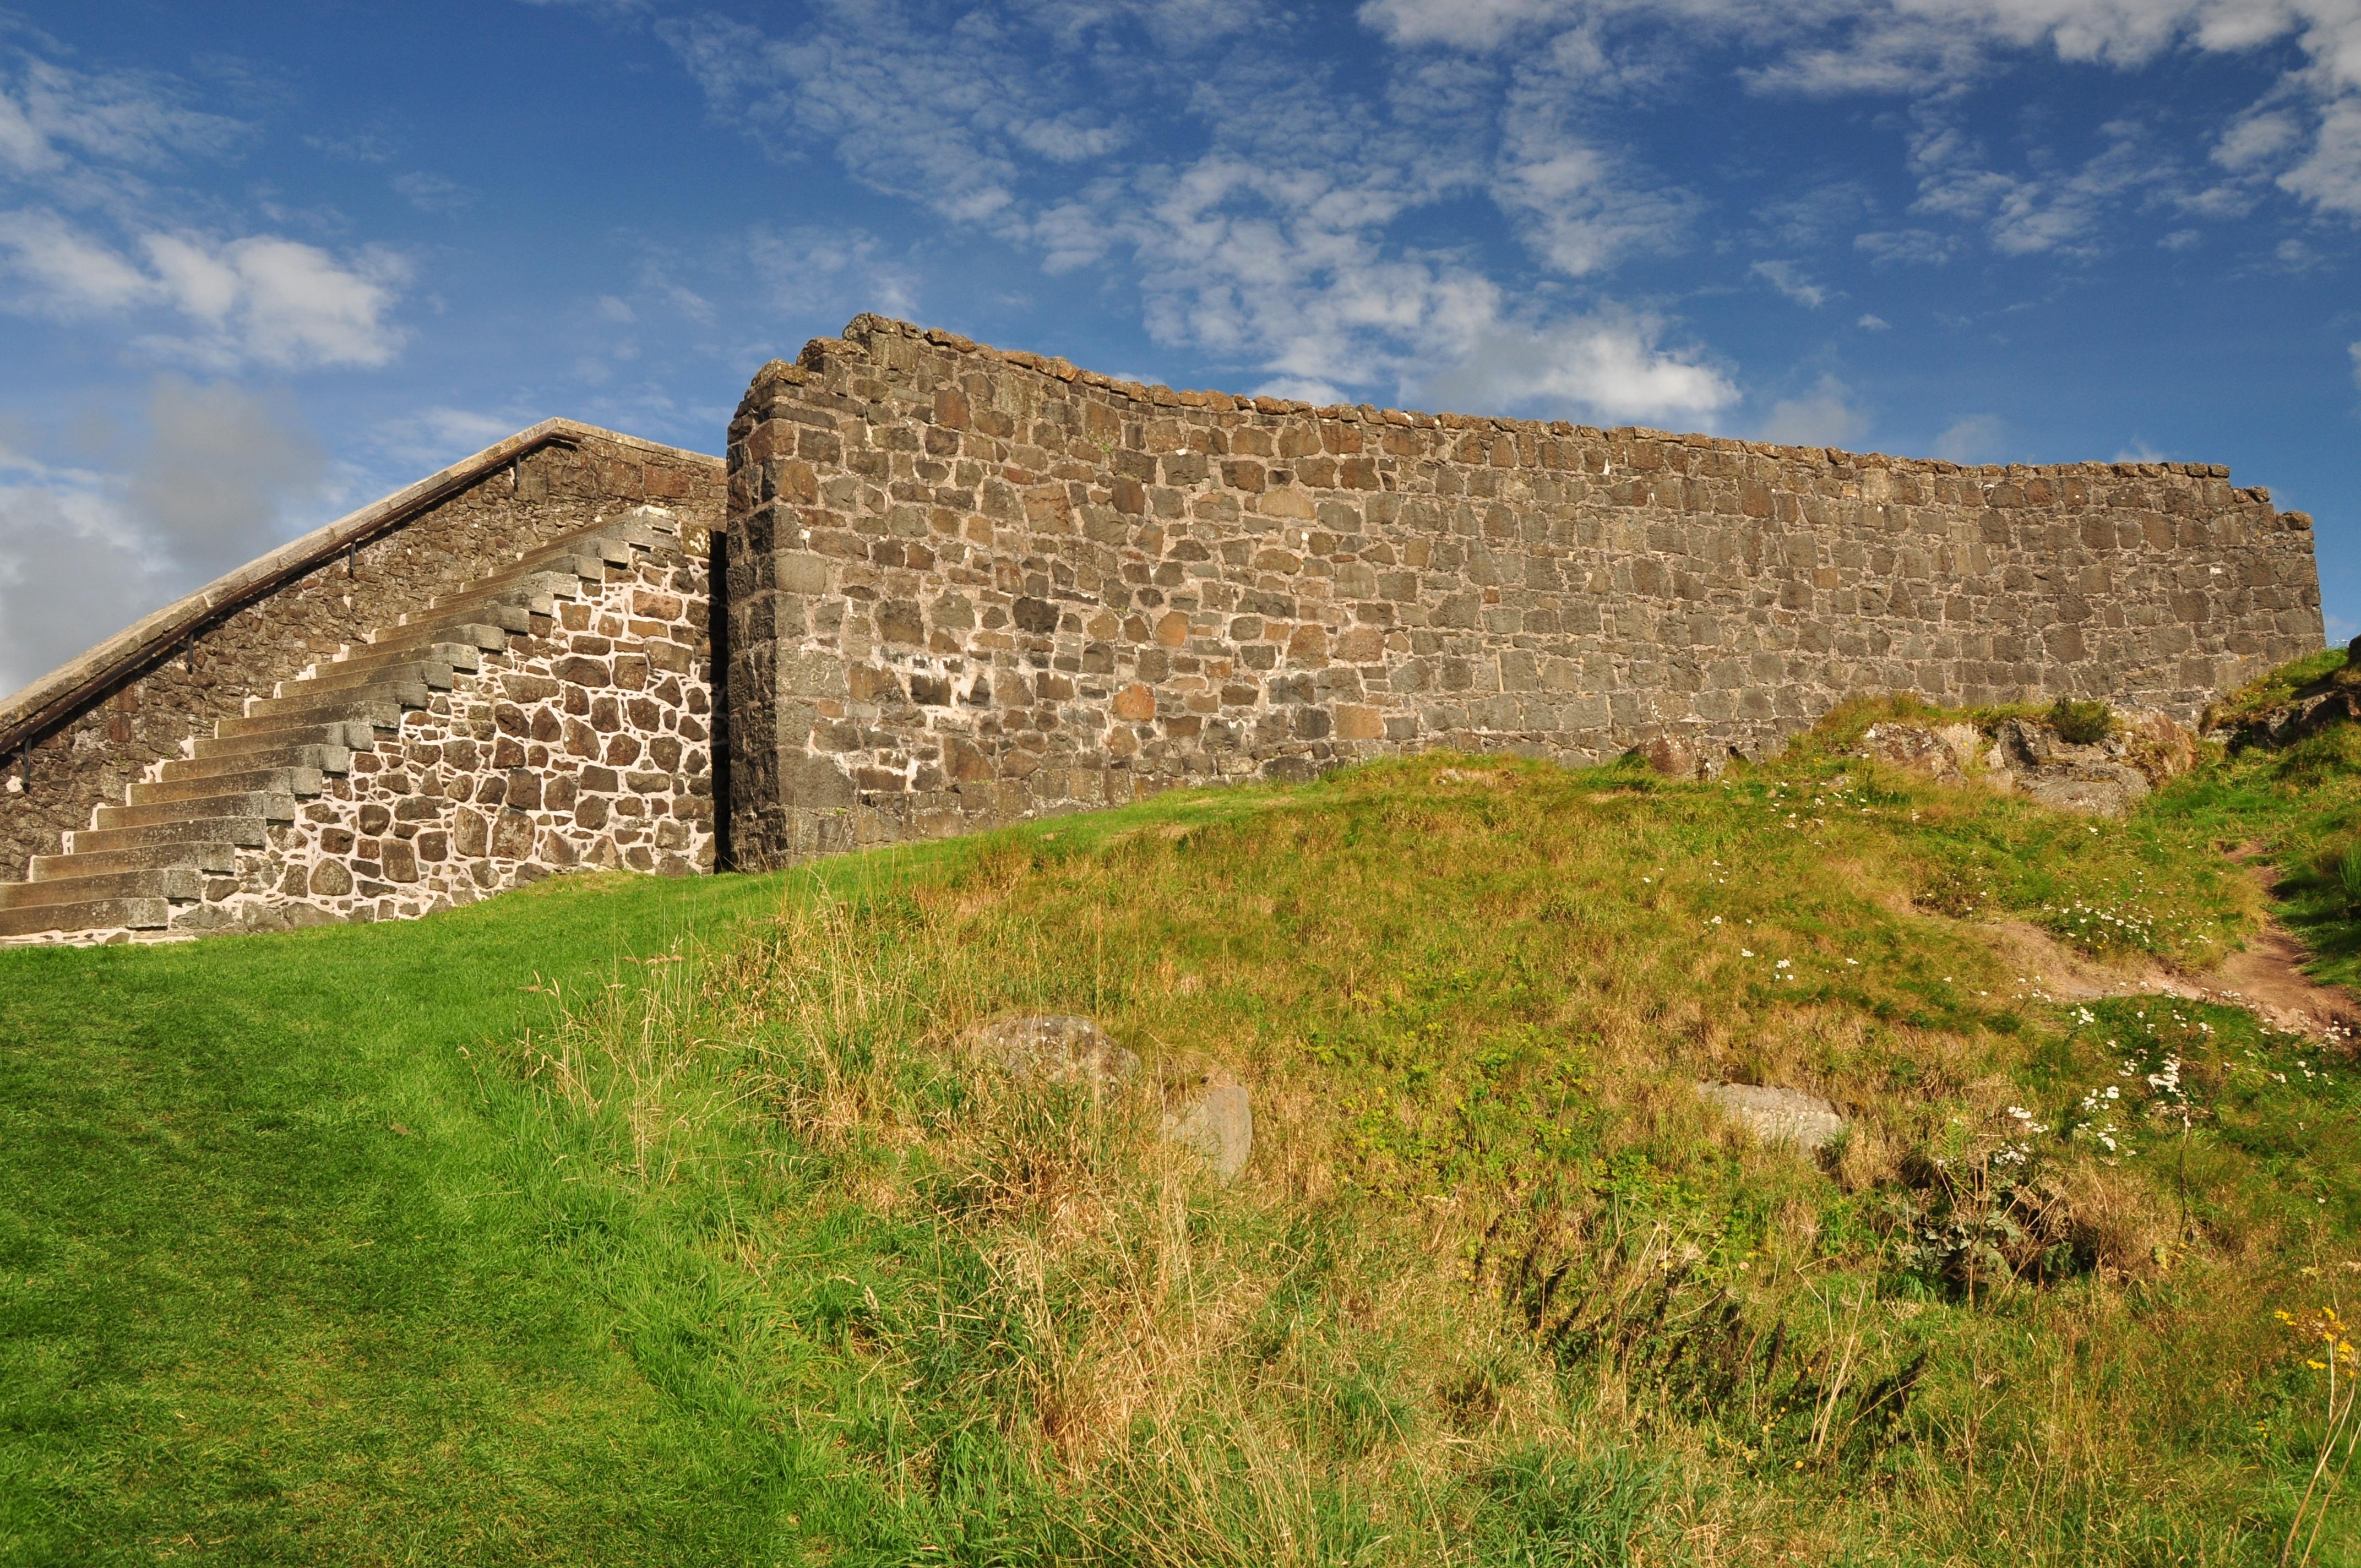 Free Images : landscape, rock, hill, building, old, monument, cliff ...